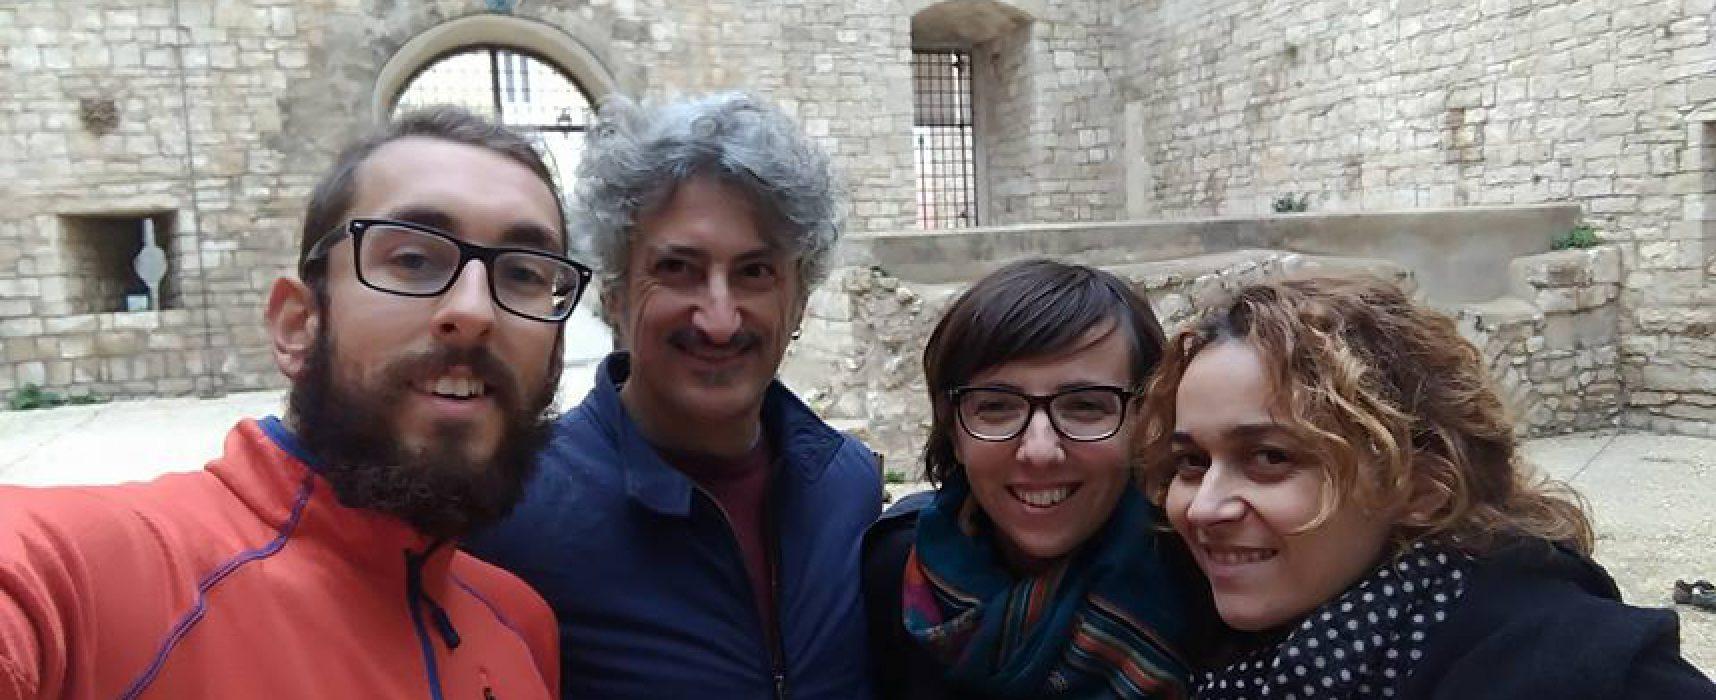 Attraversa l'Italia a piedi e fa tappa a Bisceglie, l'esperienza di Micheal Zani / FOTO